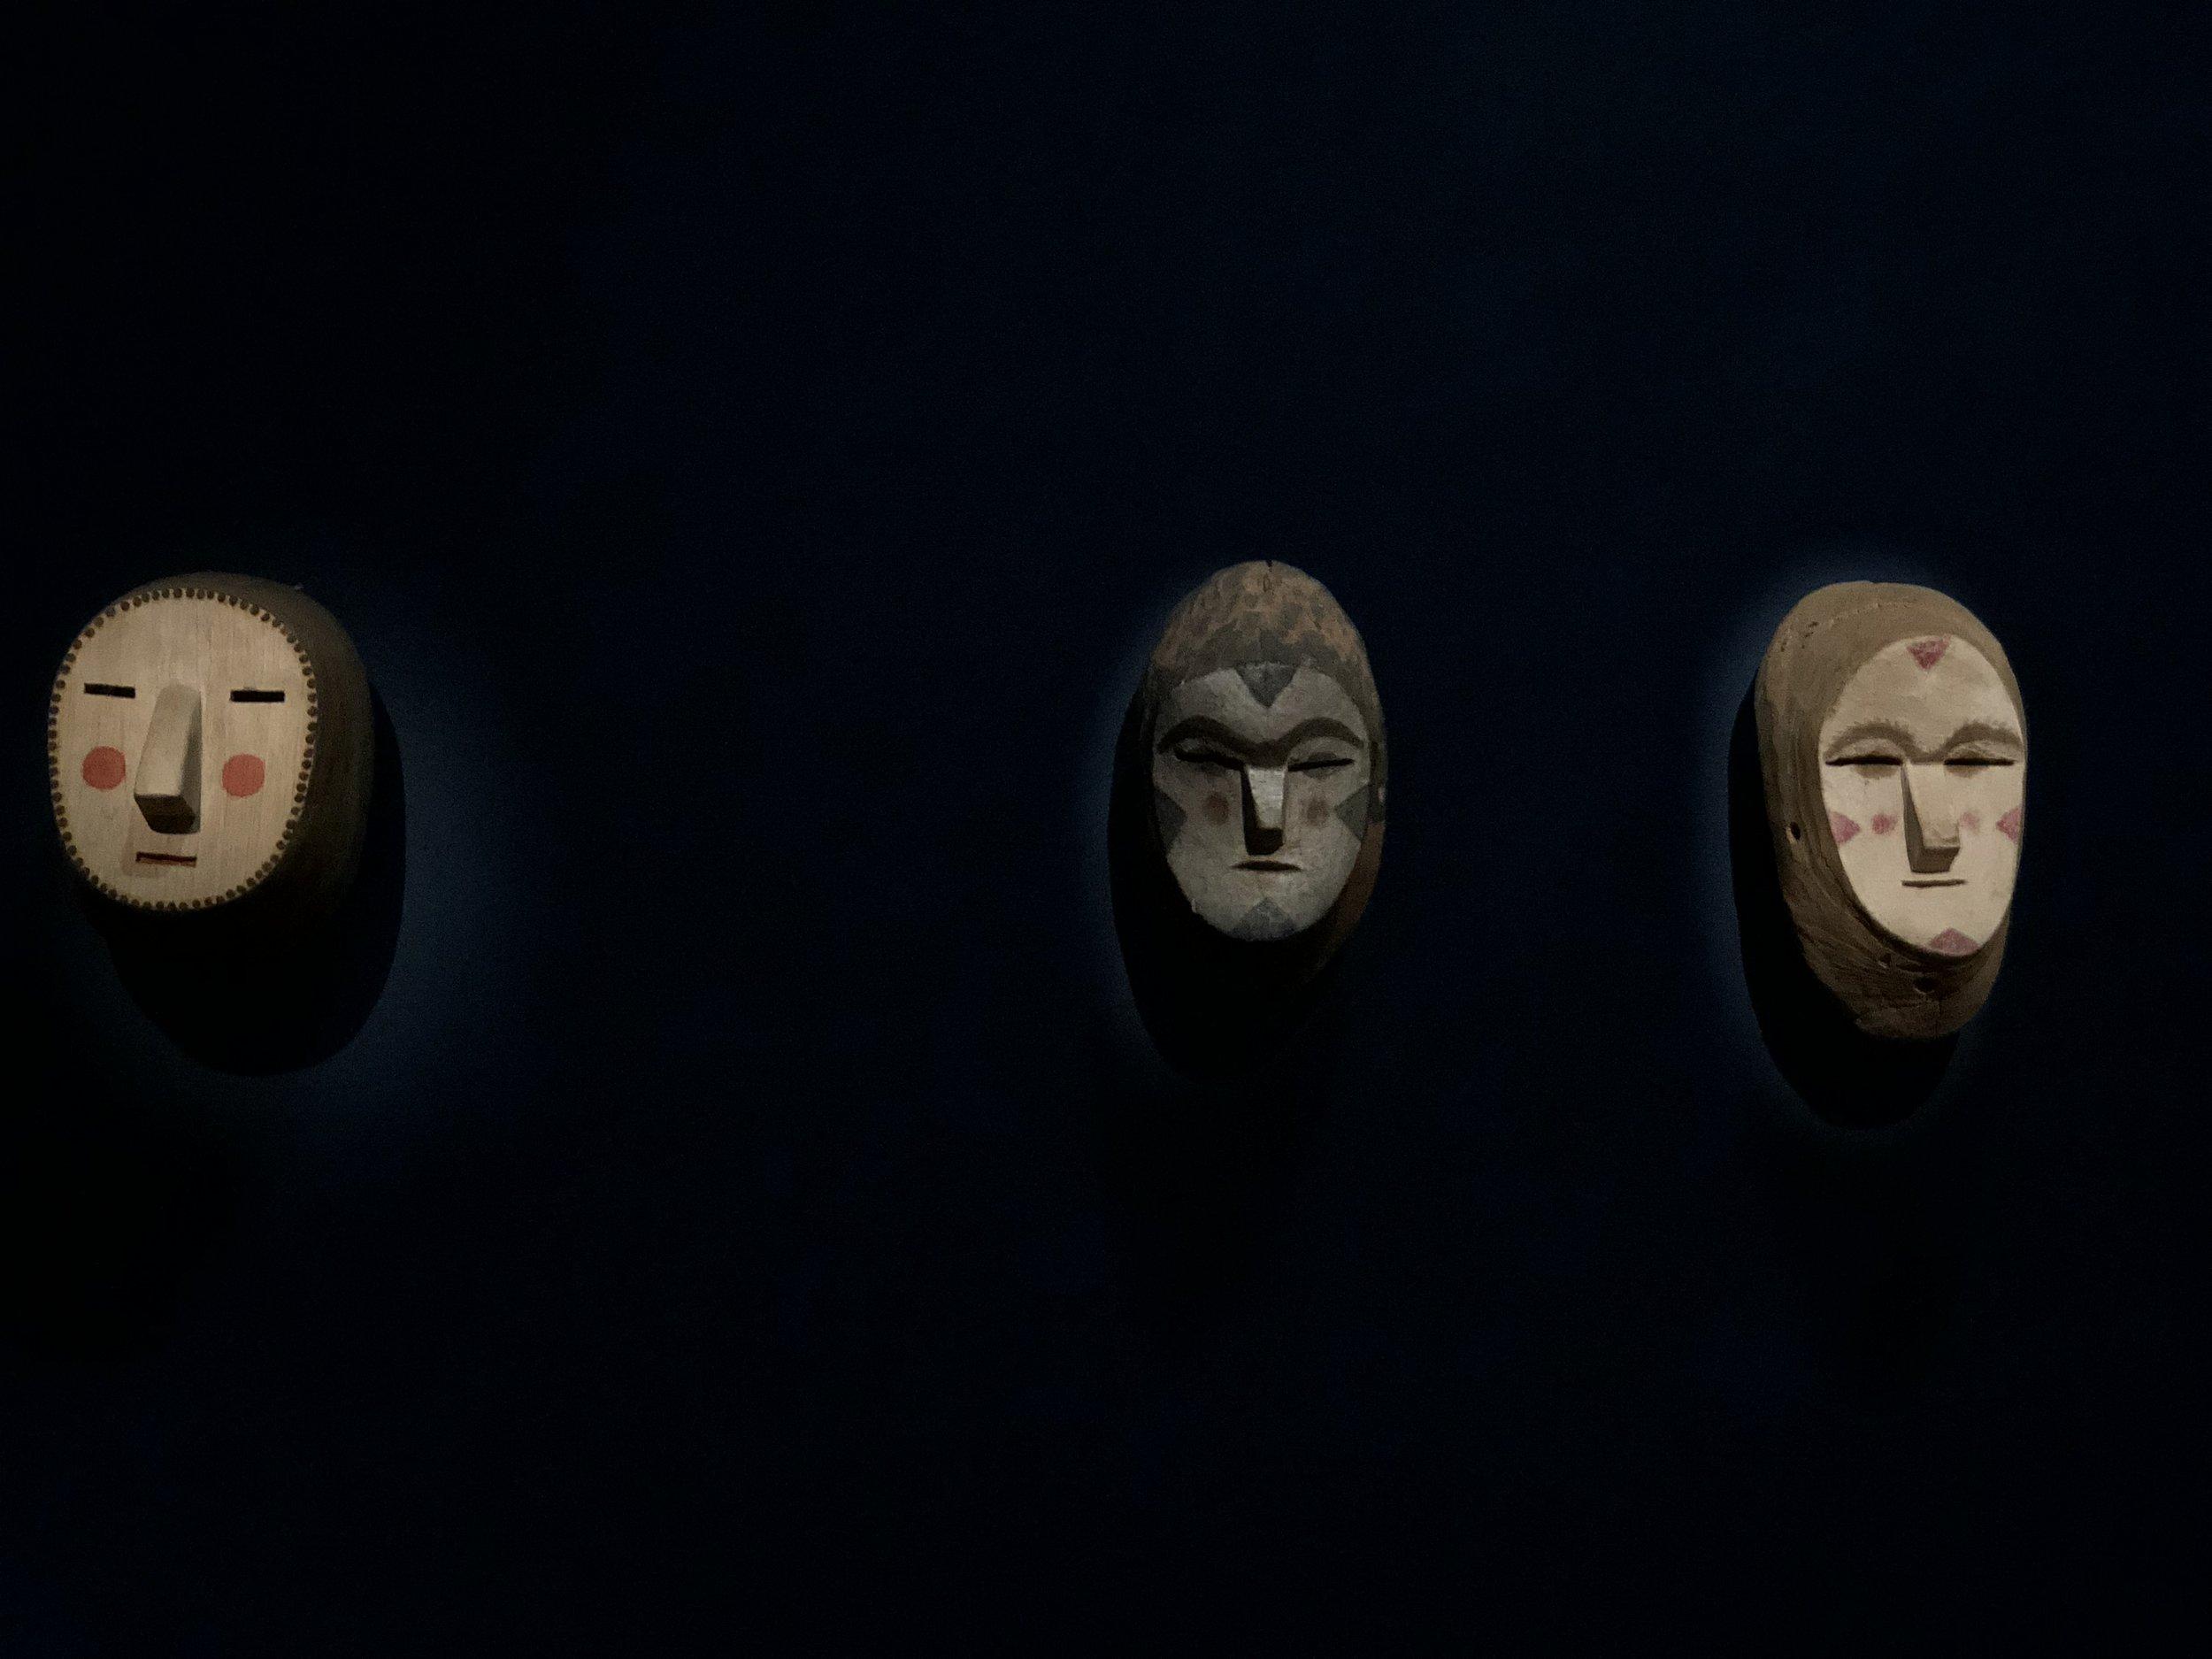 Above; Chiriguano-Guaraní, Anonymous, Aguero-guero, c. 2000, c. 1990, c. 1990